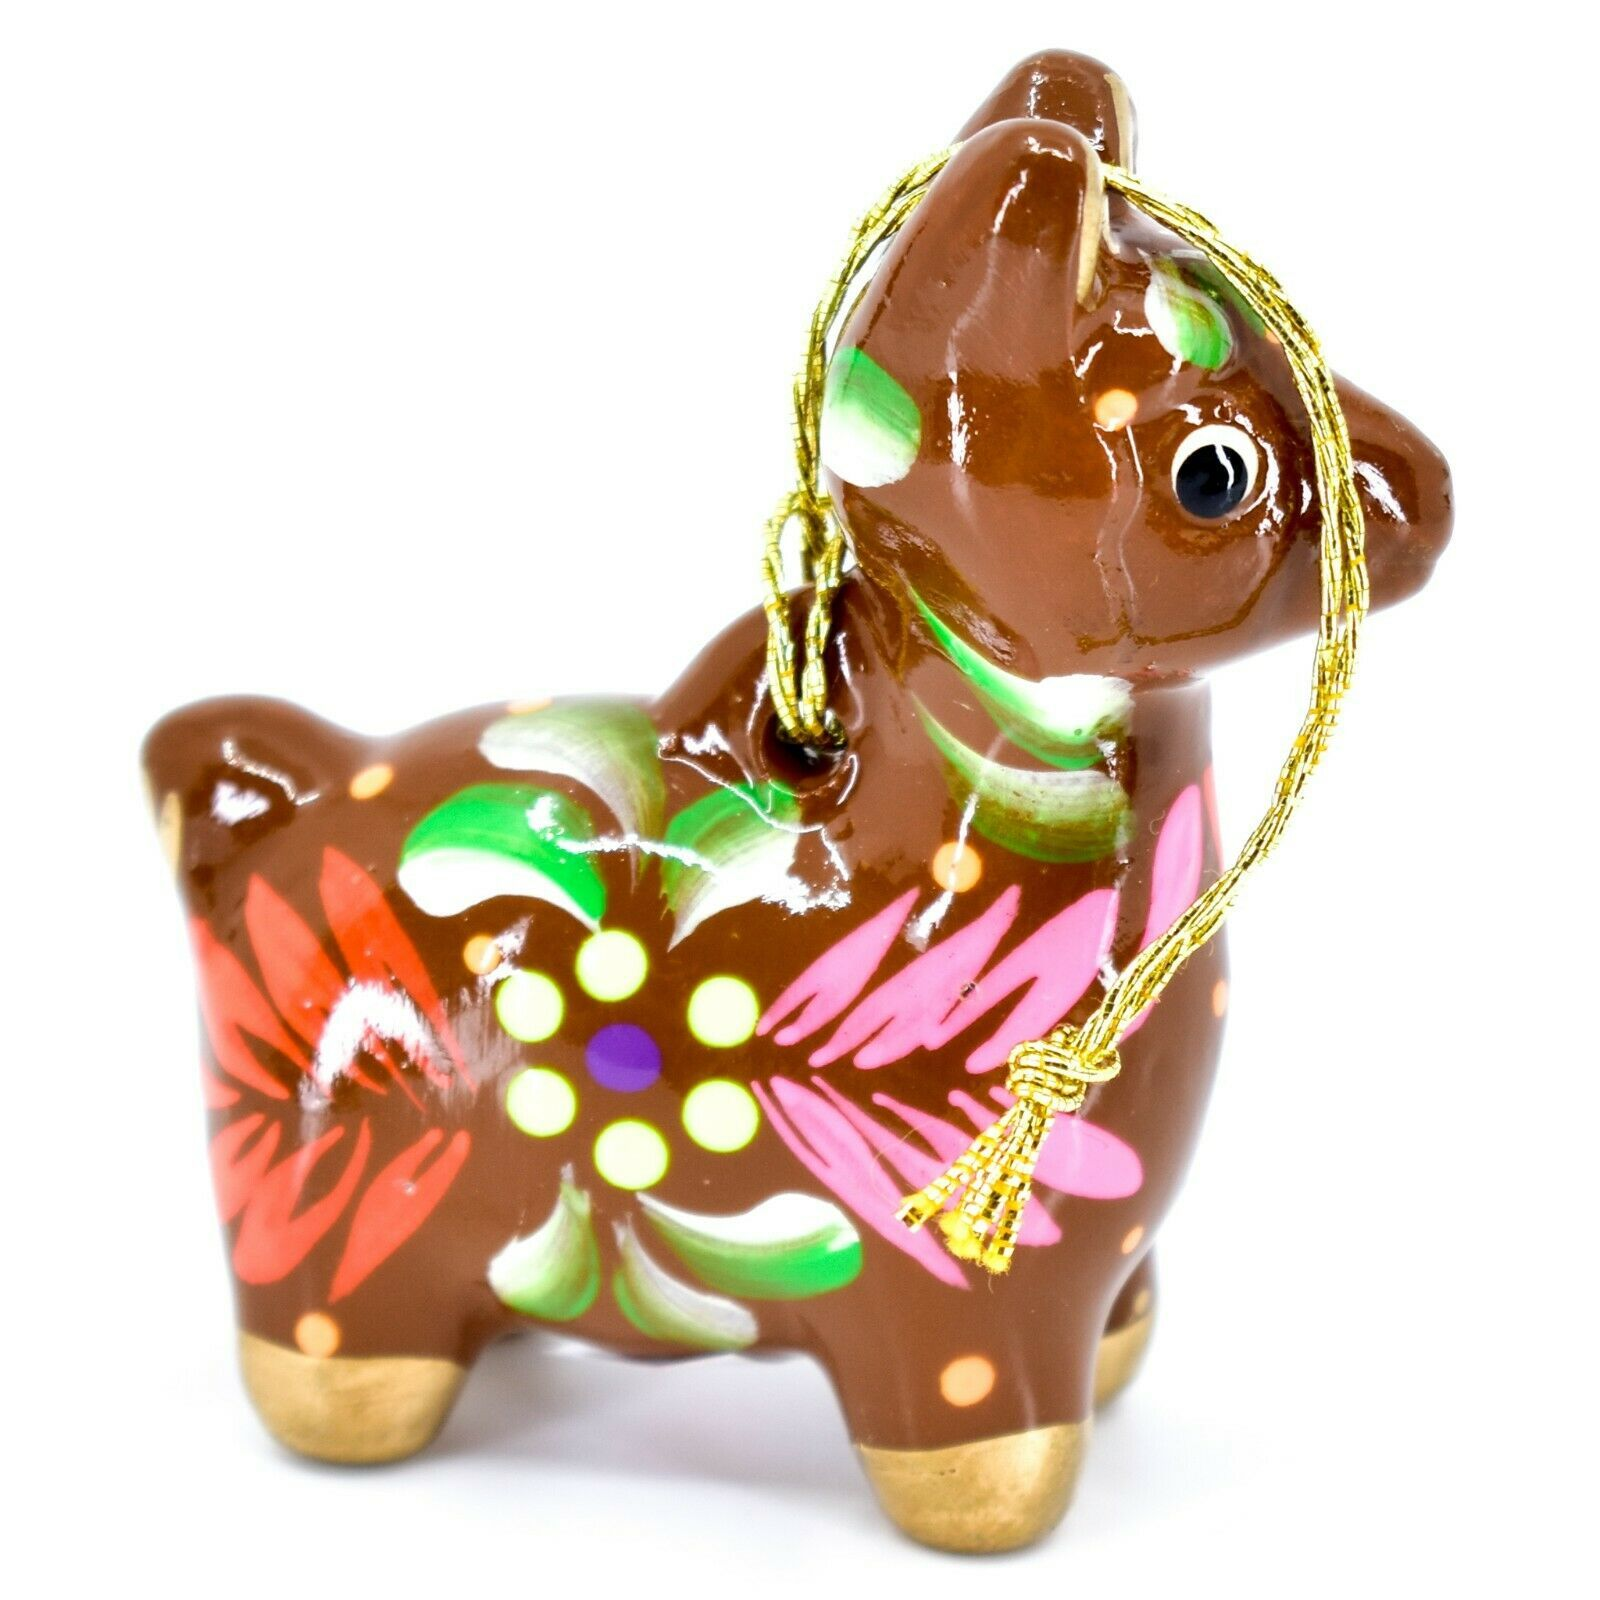 Handcrafted Painted Ceramic Brown Llama Confetti Ornament Made in Peru